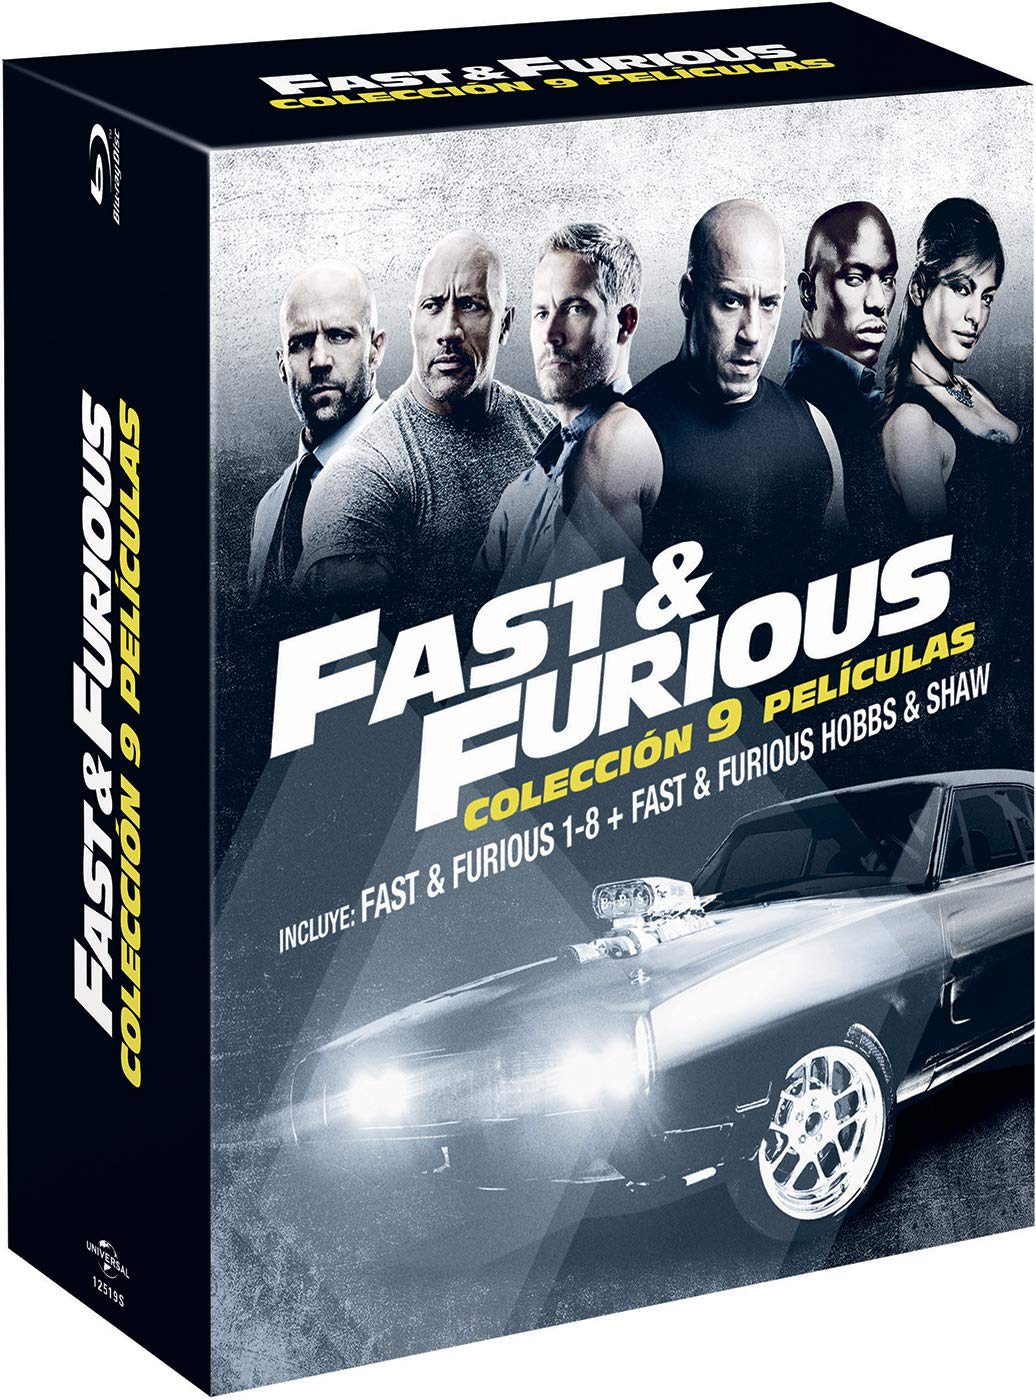 Pack: Fast & Furious 1-8 + Hobbs & Shaw BD Blu-ray: Amazon.es: Dwayne Johnson, Jason Statham, Vin Diesel, Paul Walker, David Leitch, James Wan, Justin Lin, Dwayne Johnson, Jason Statham, Chris Morgan